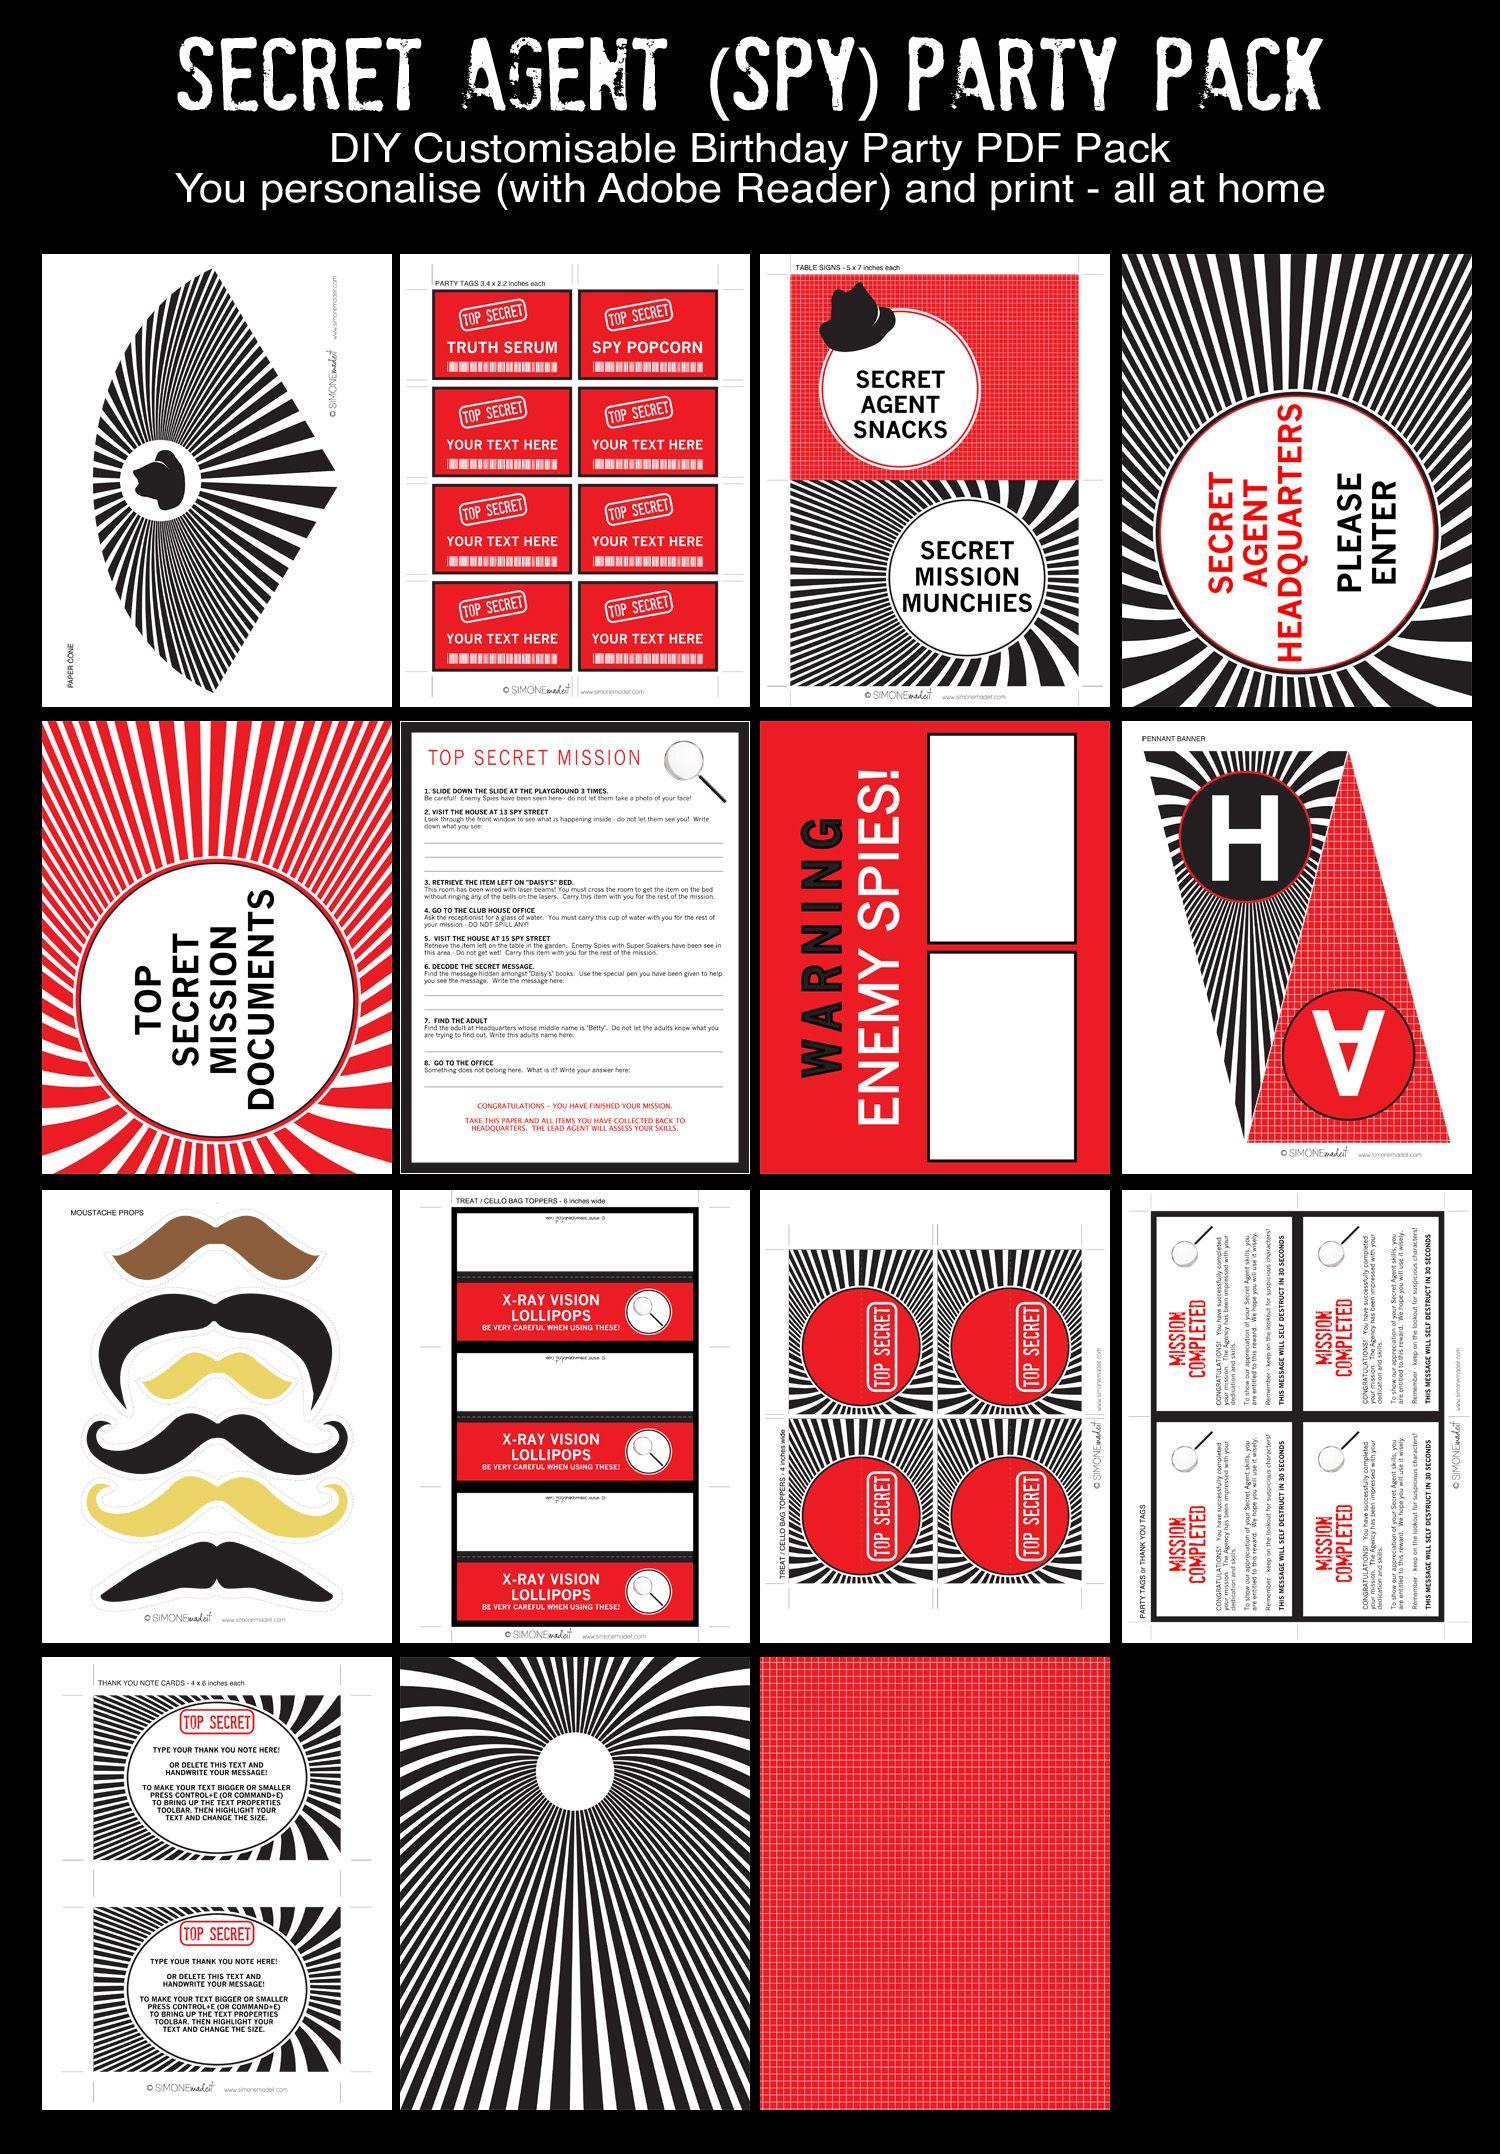 Spy Party Printables, Invitations & Decorations